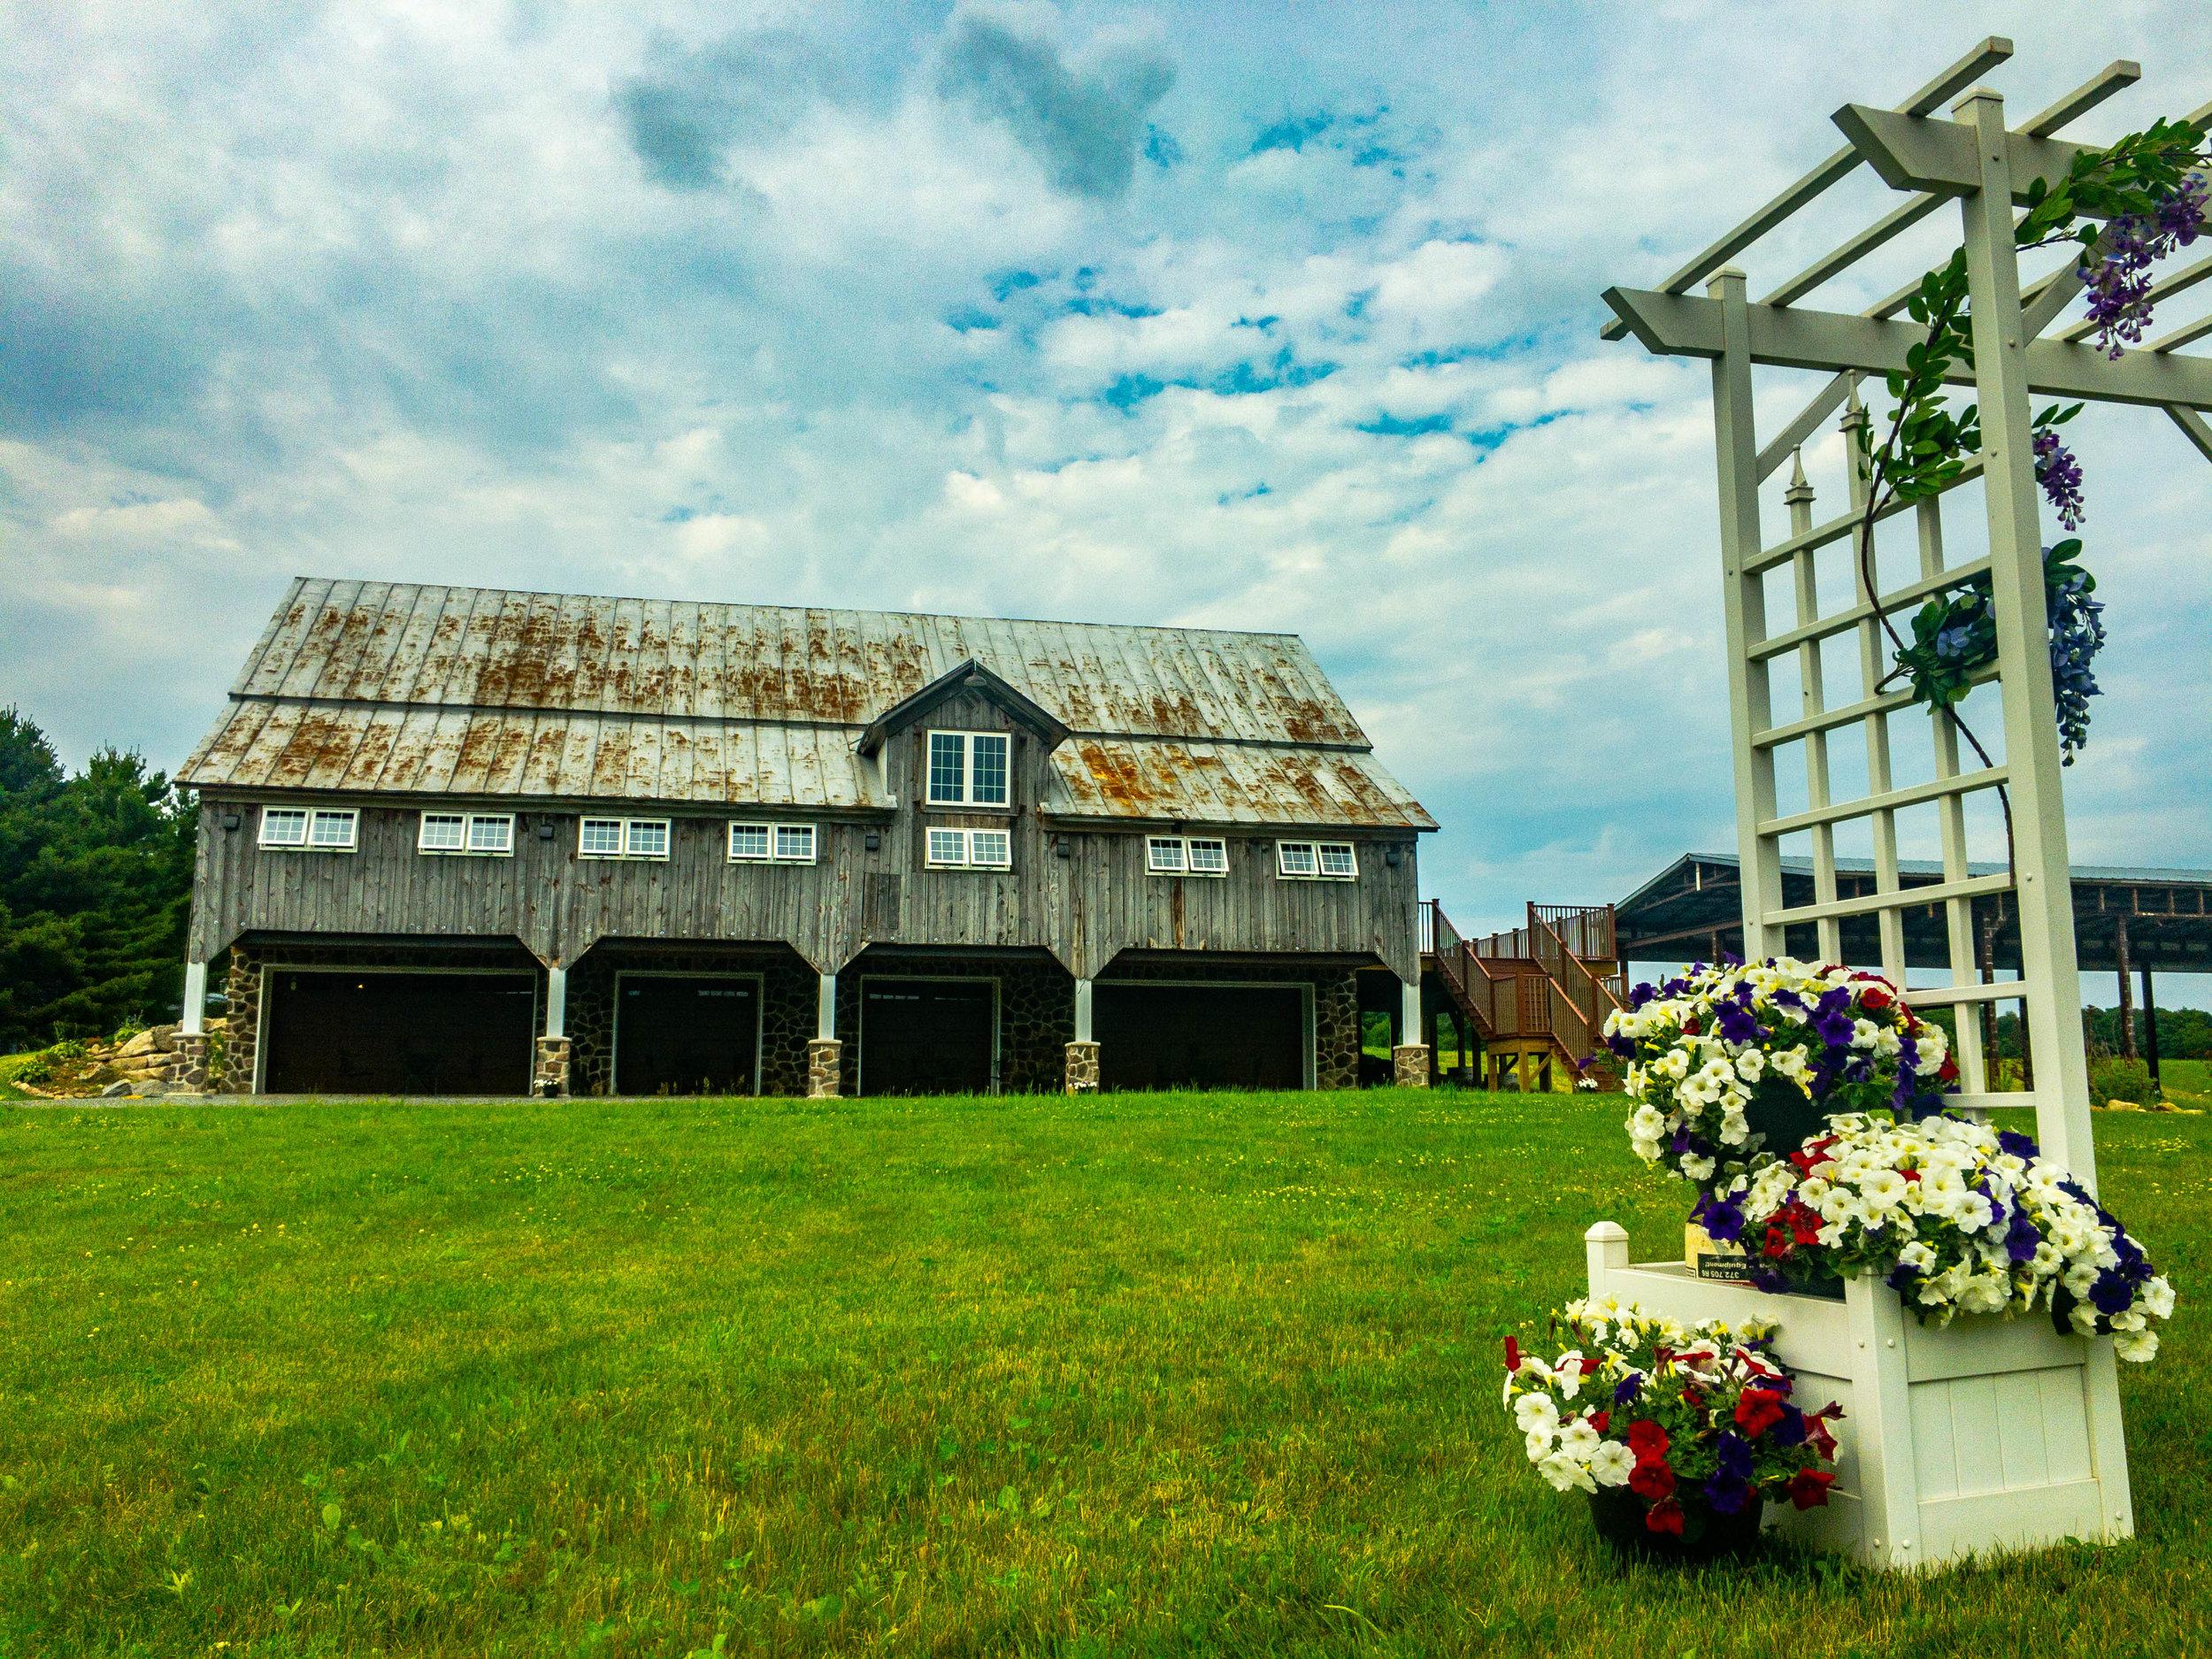 Trillium Creek Barn